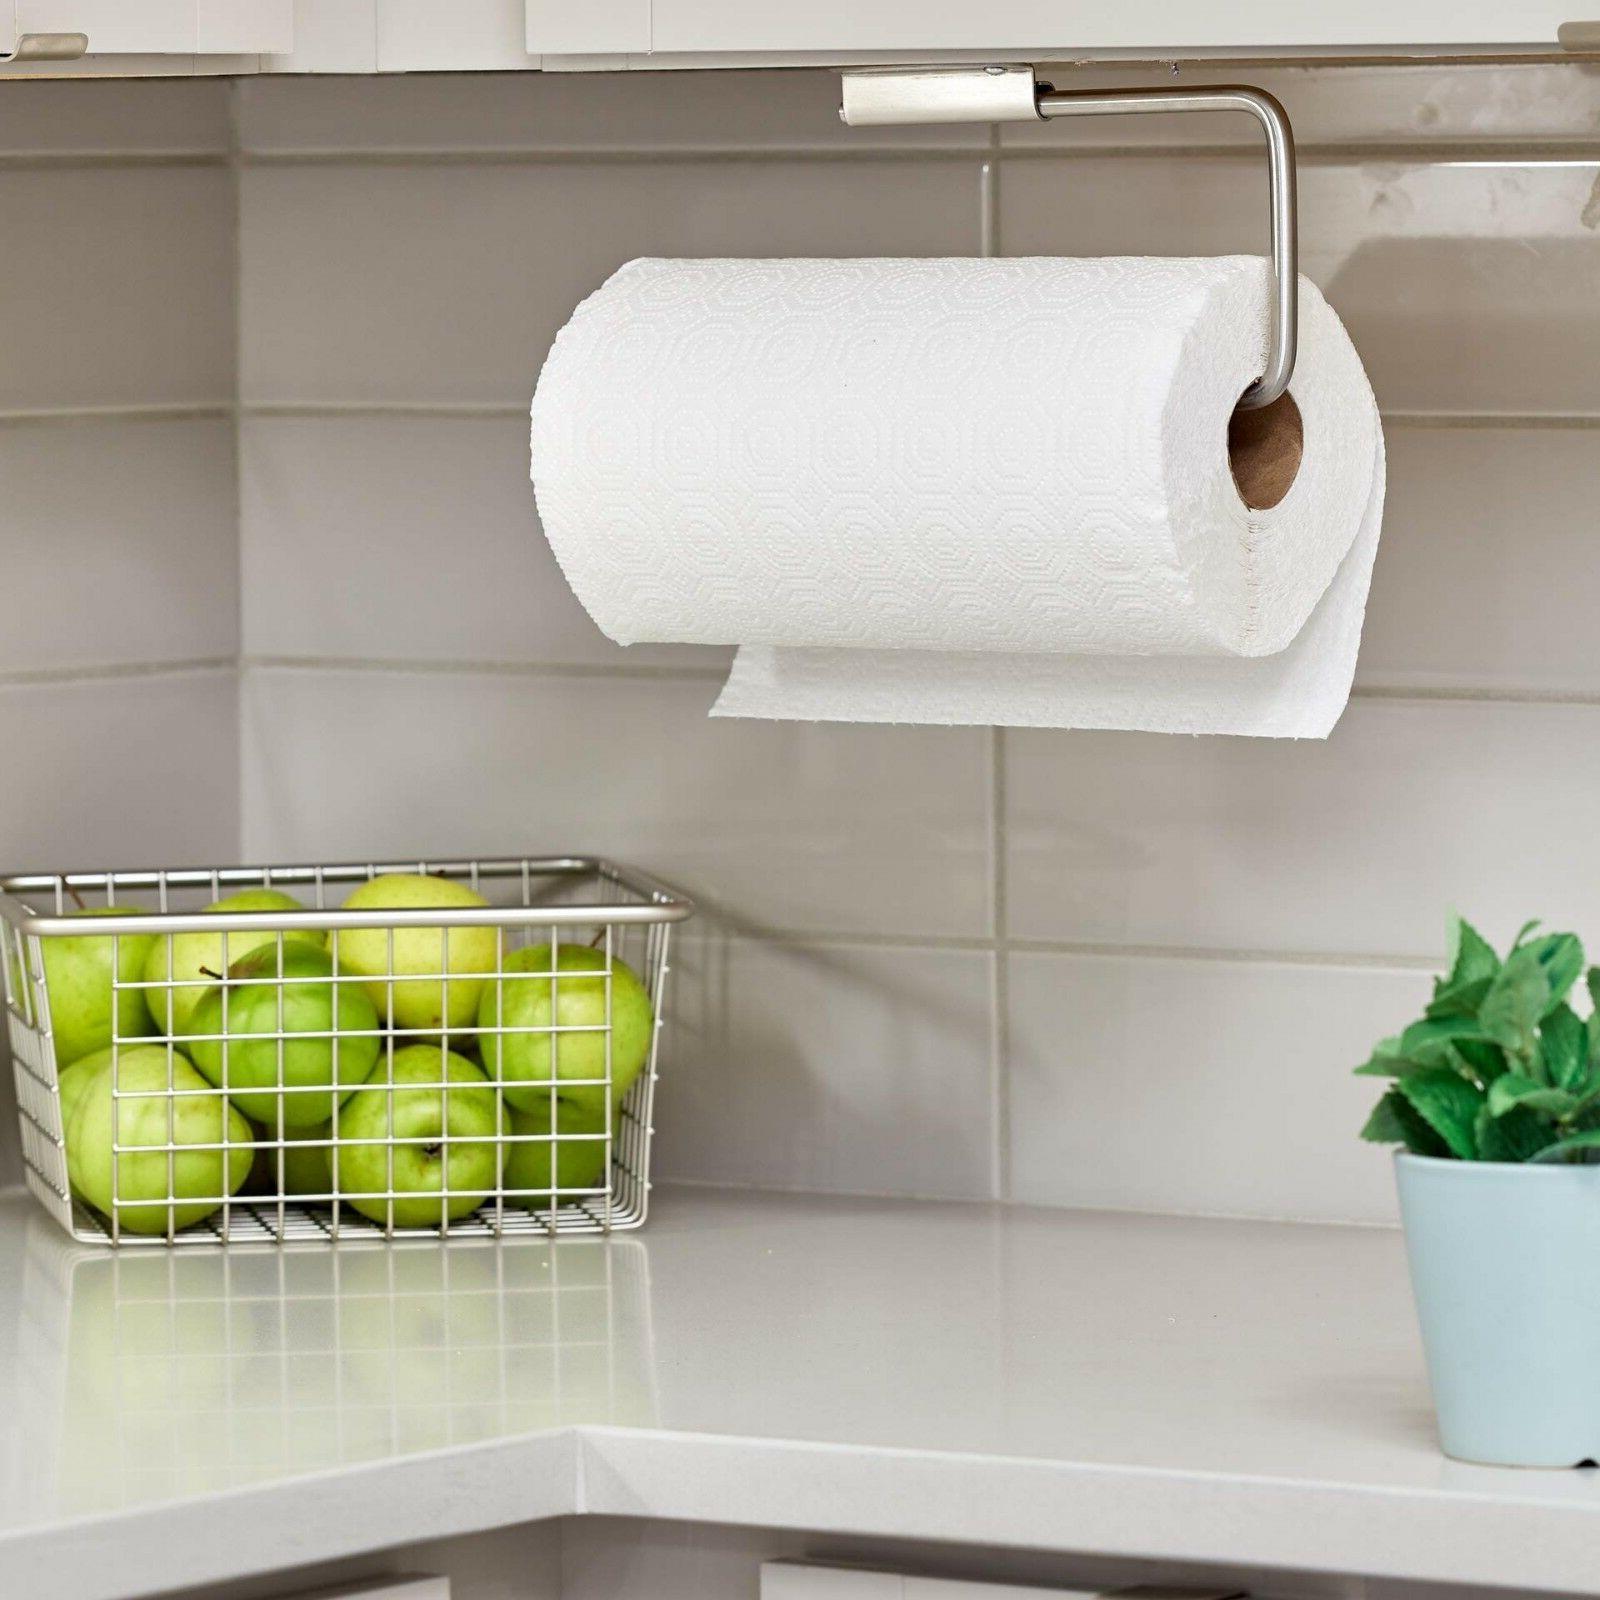 InterDesign Forma Swivel Towel Mount/Under